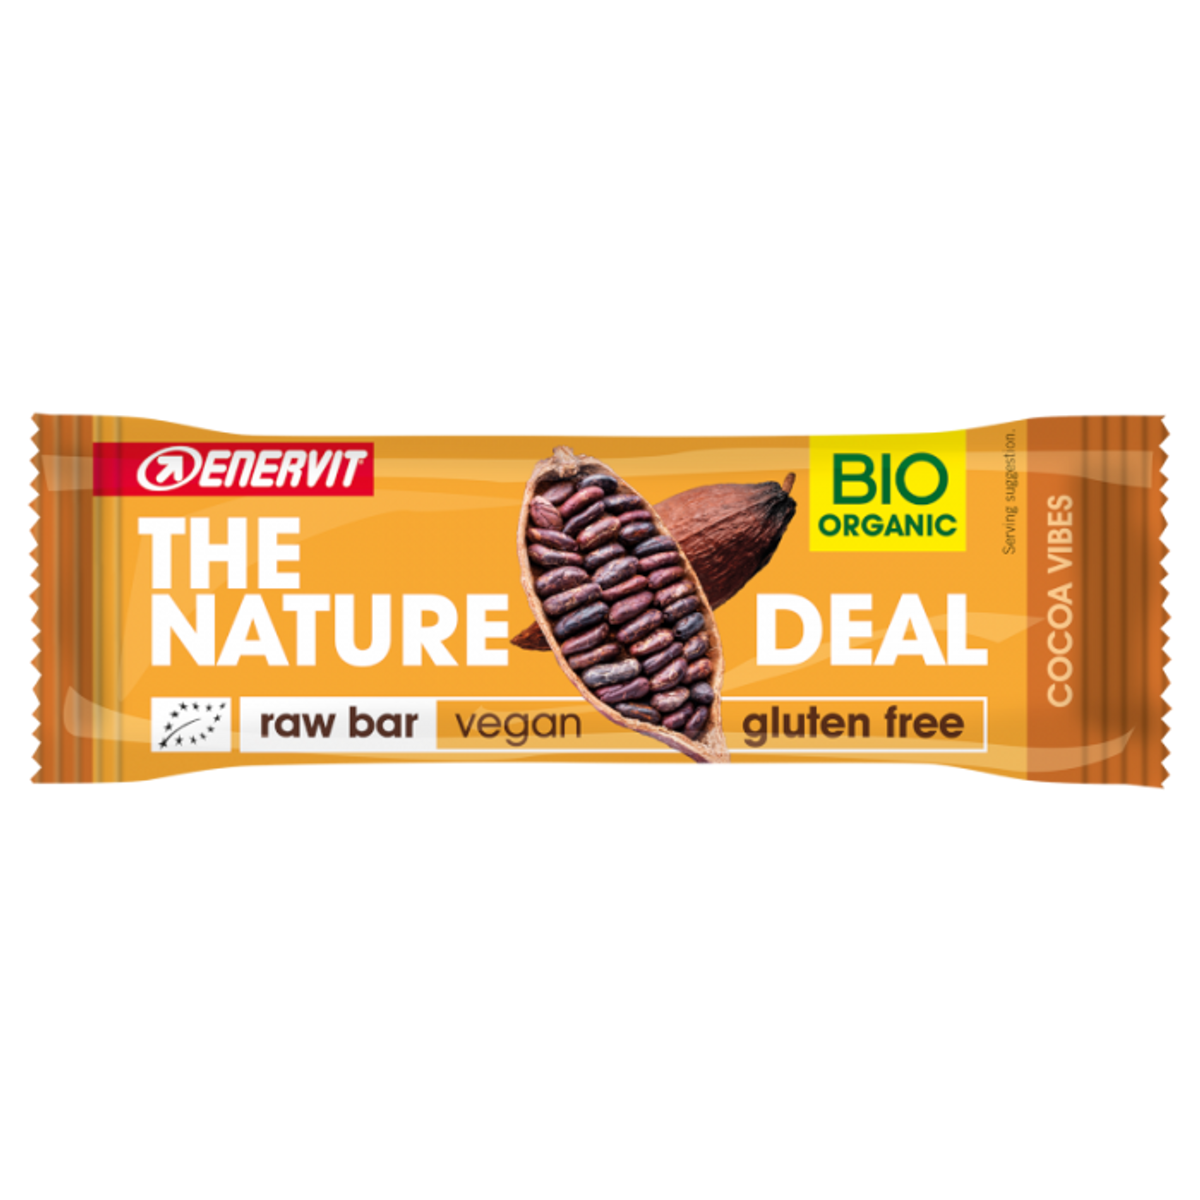 Raw Bar Vegan COCOA VIBES 30g / Enervit - The Natural Deal